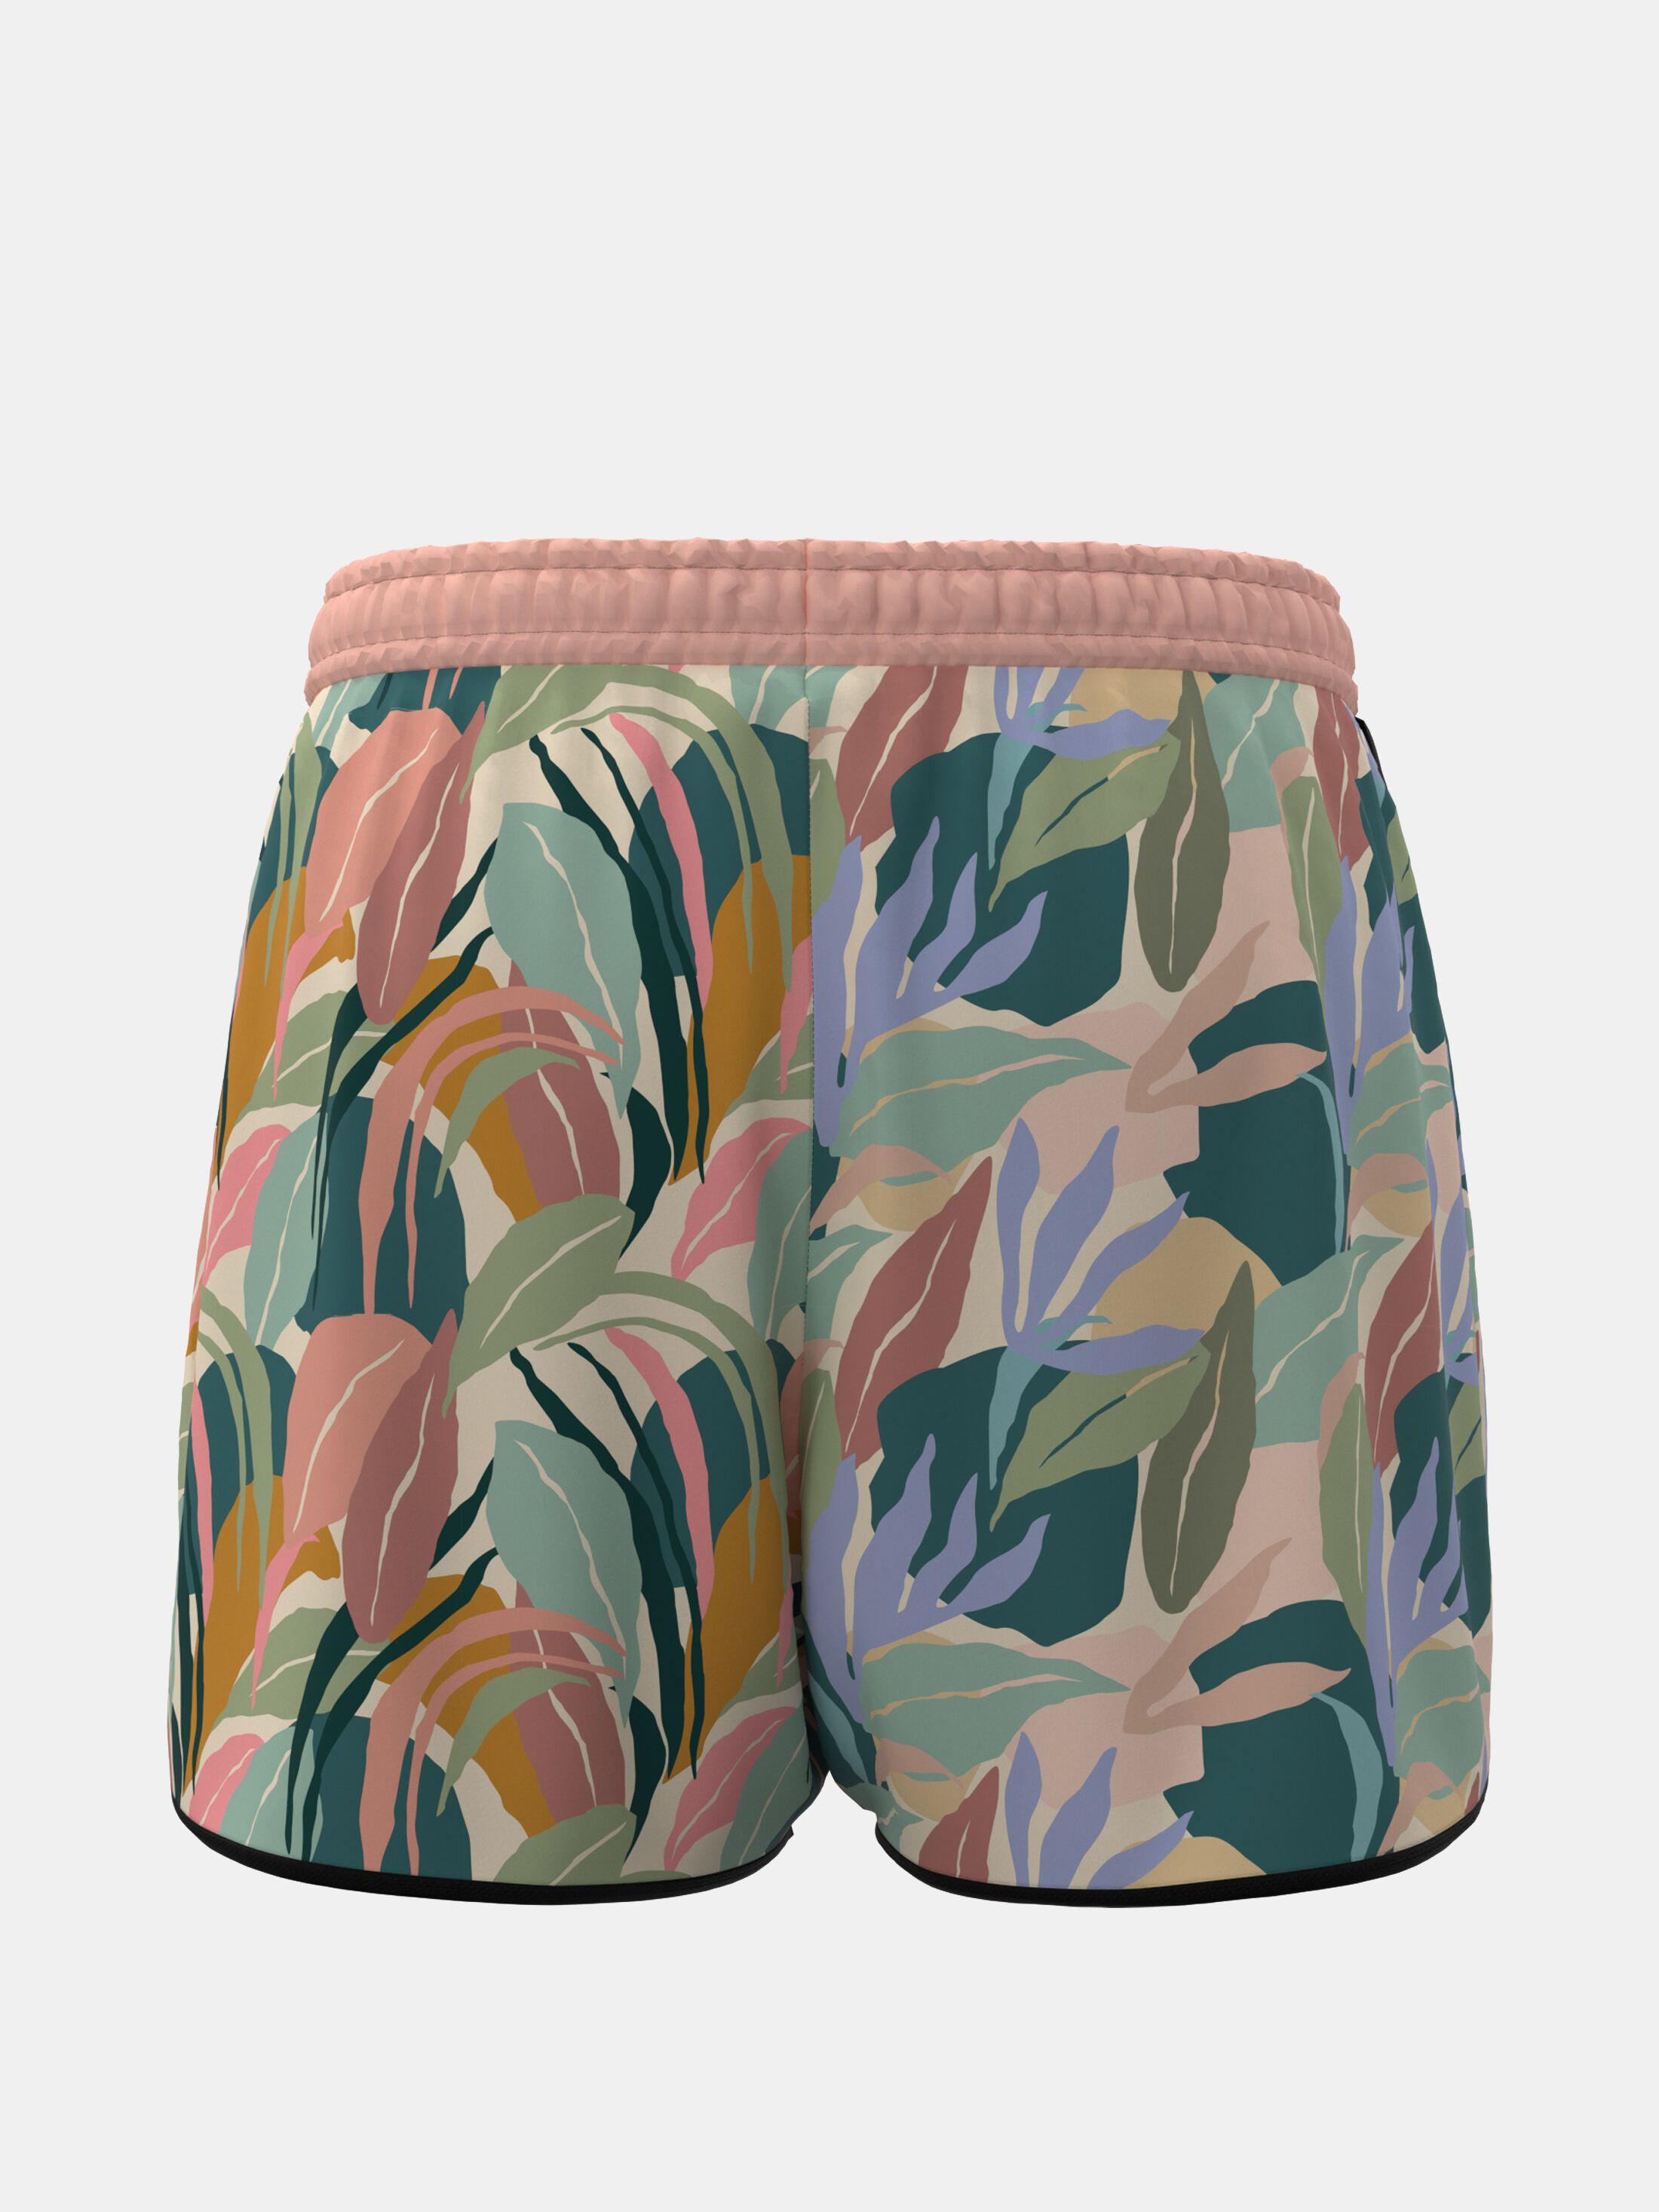 custom women's athletic shorts